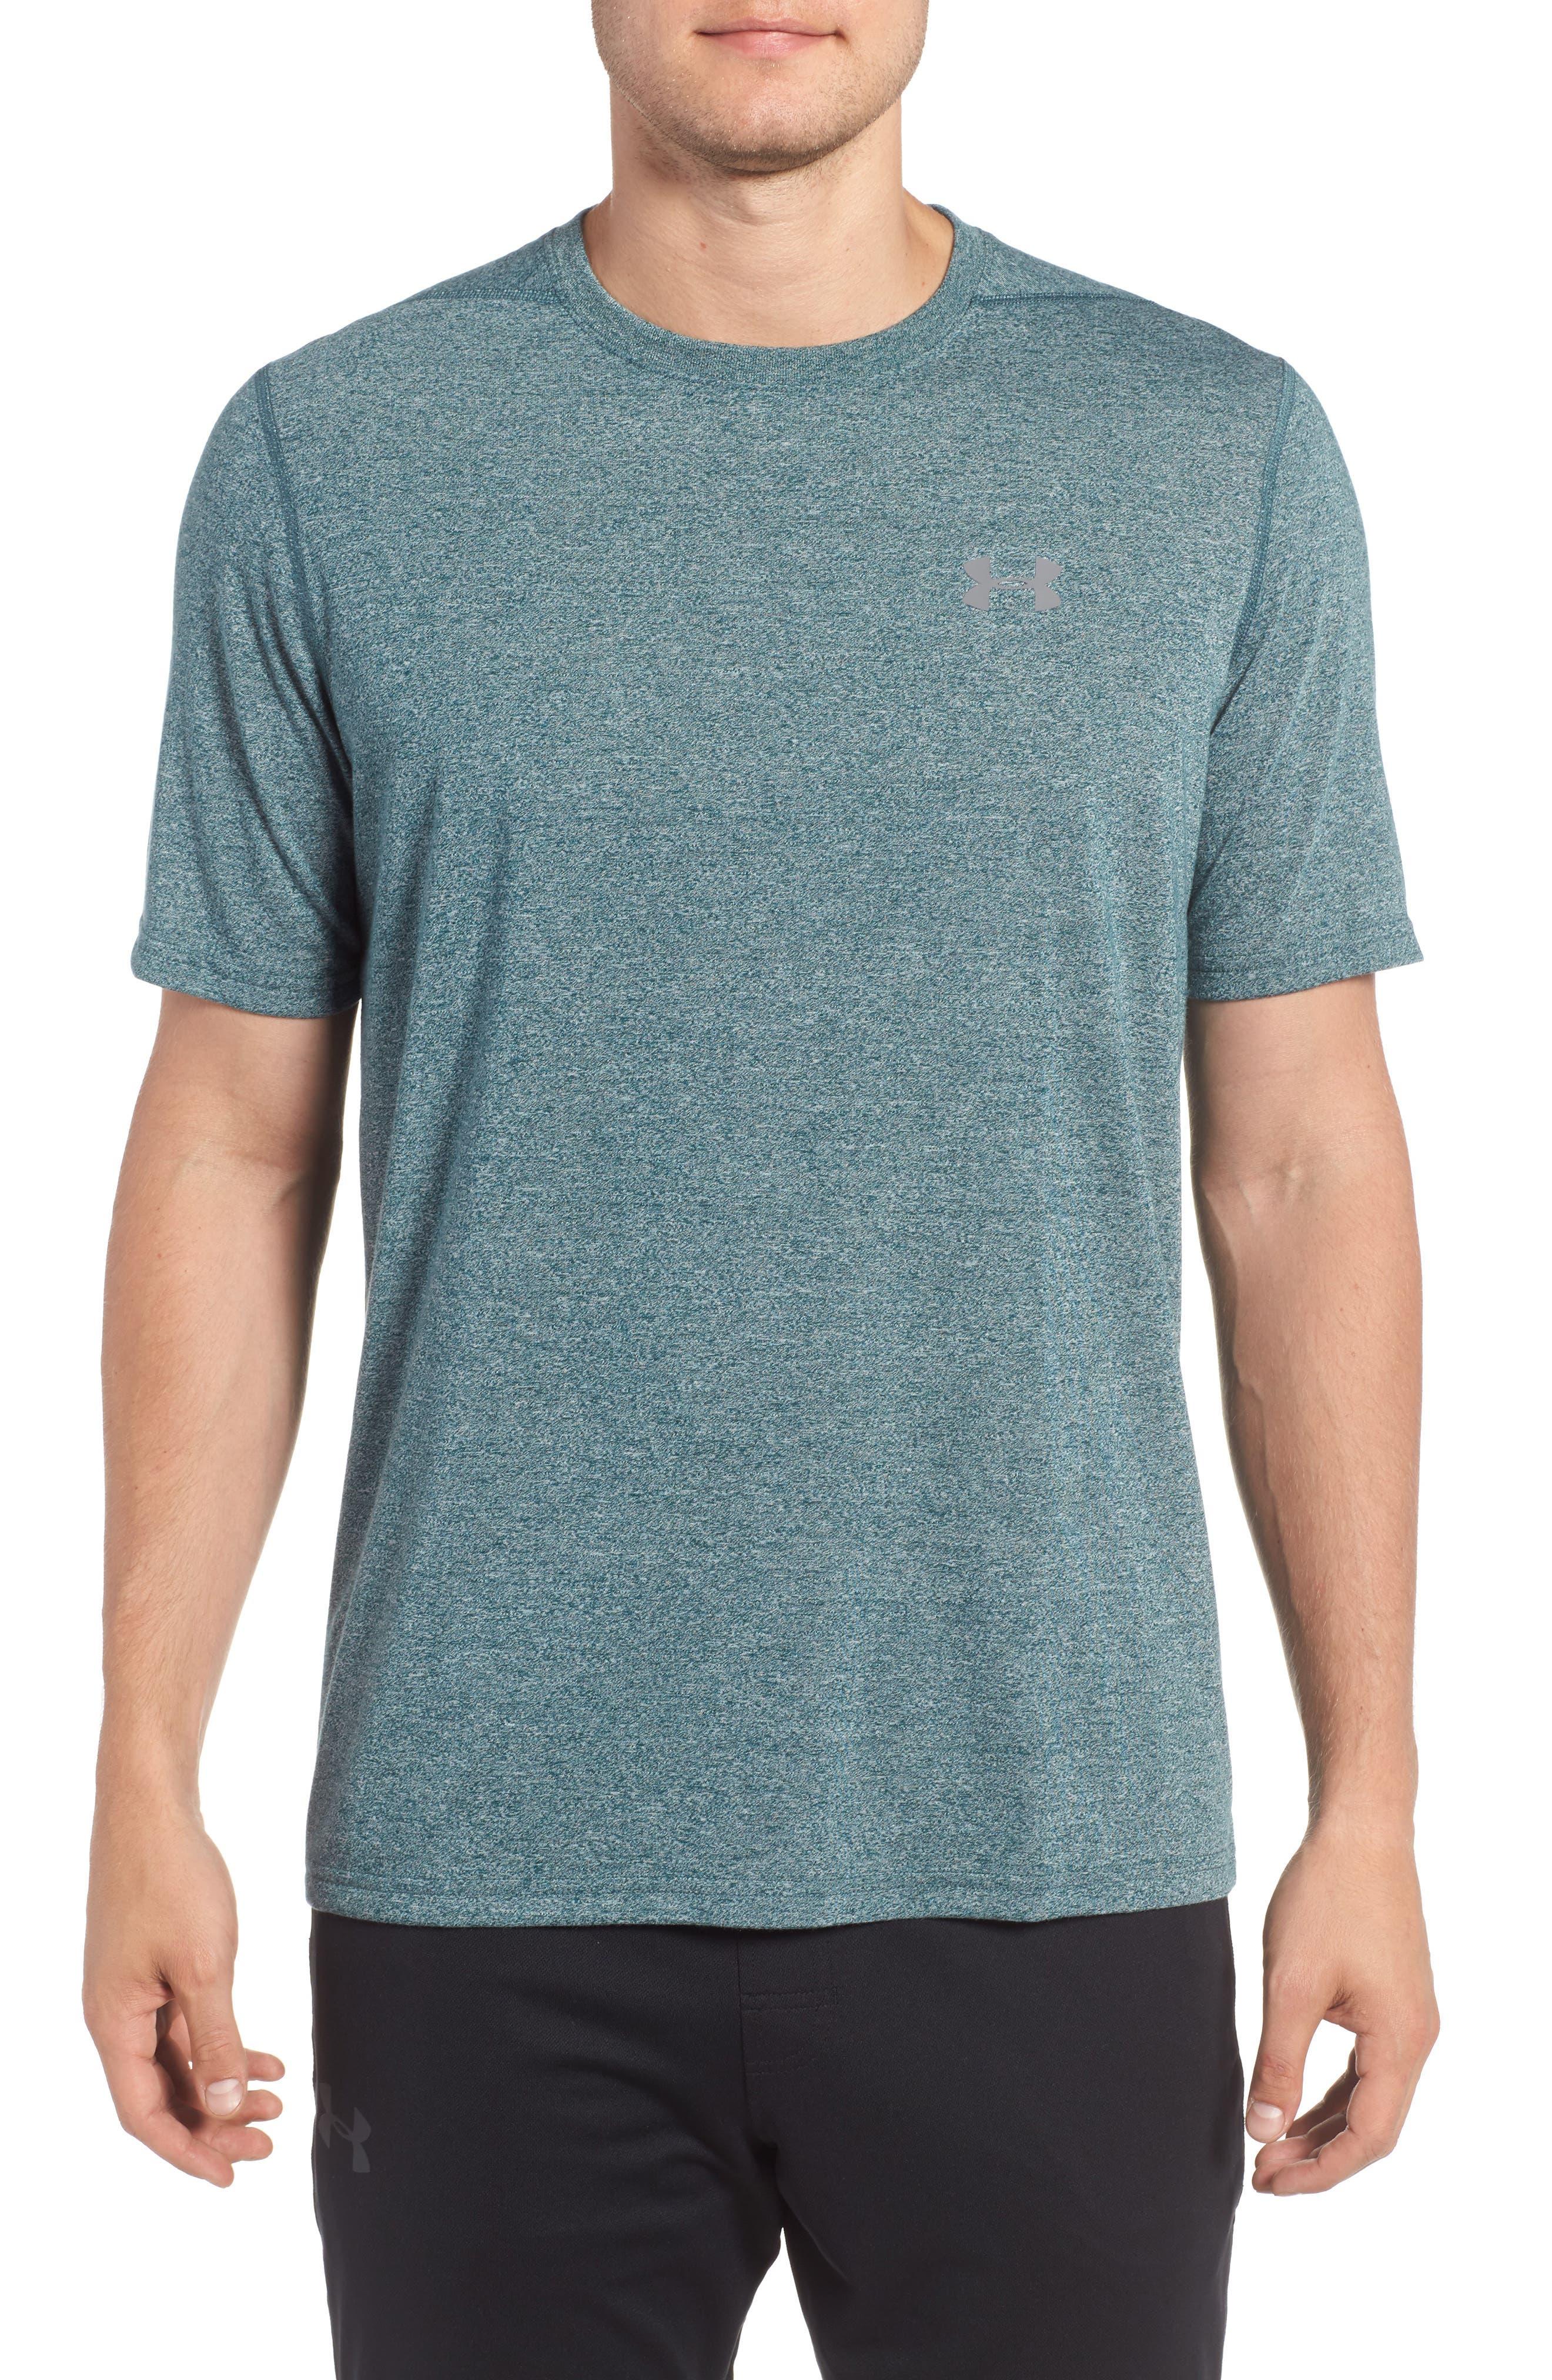 Under Armour Regular Fit Threadborne T-Shirt